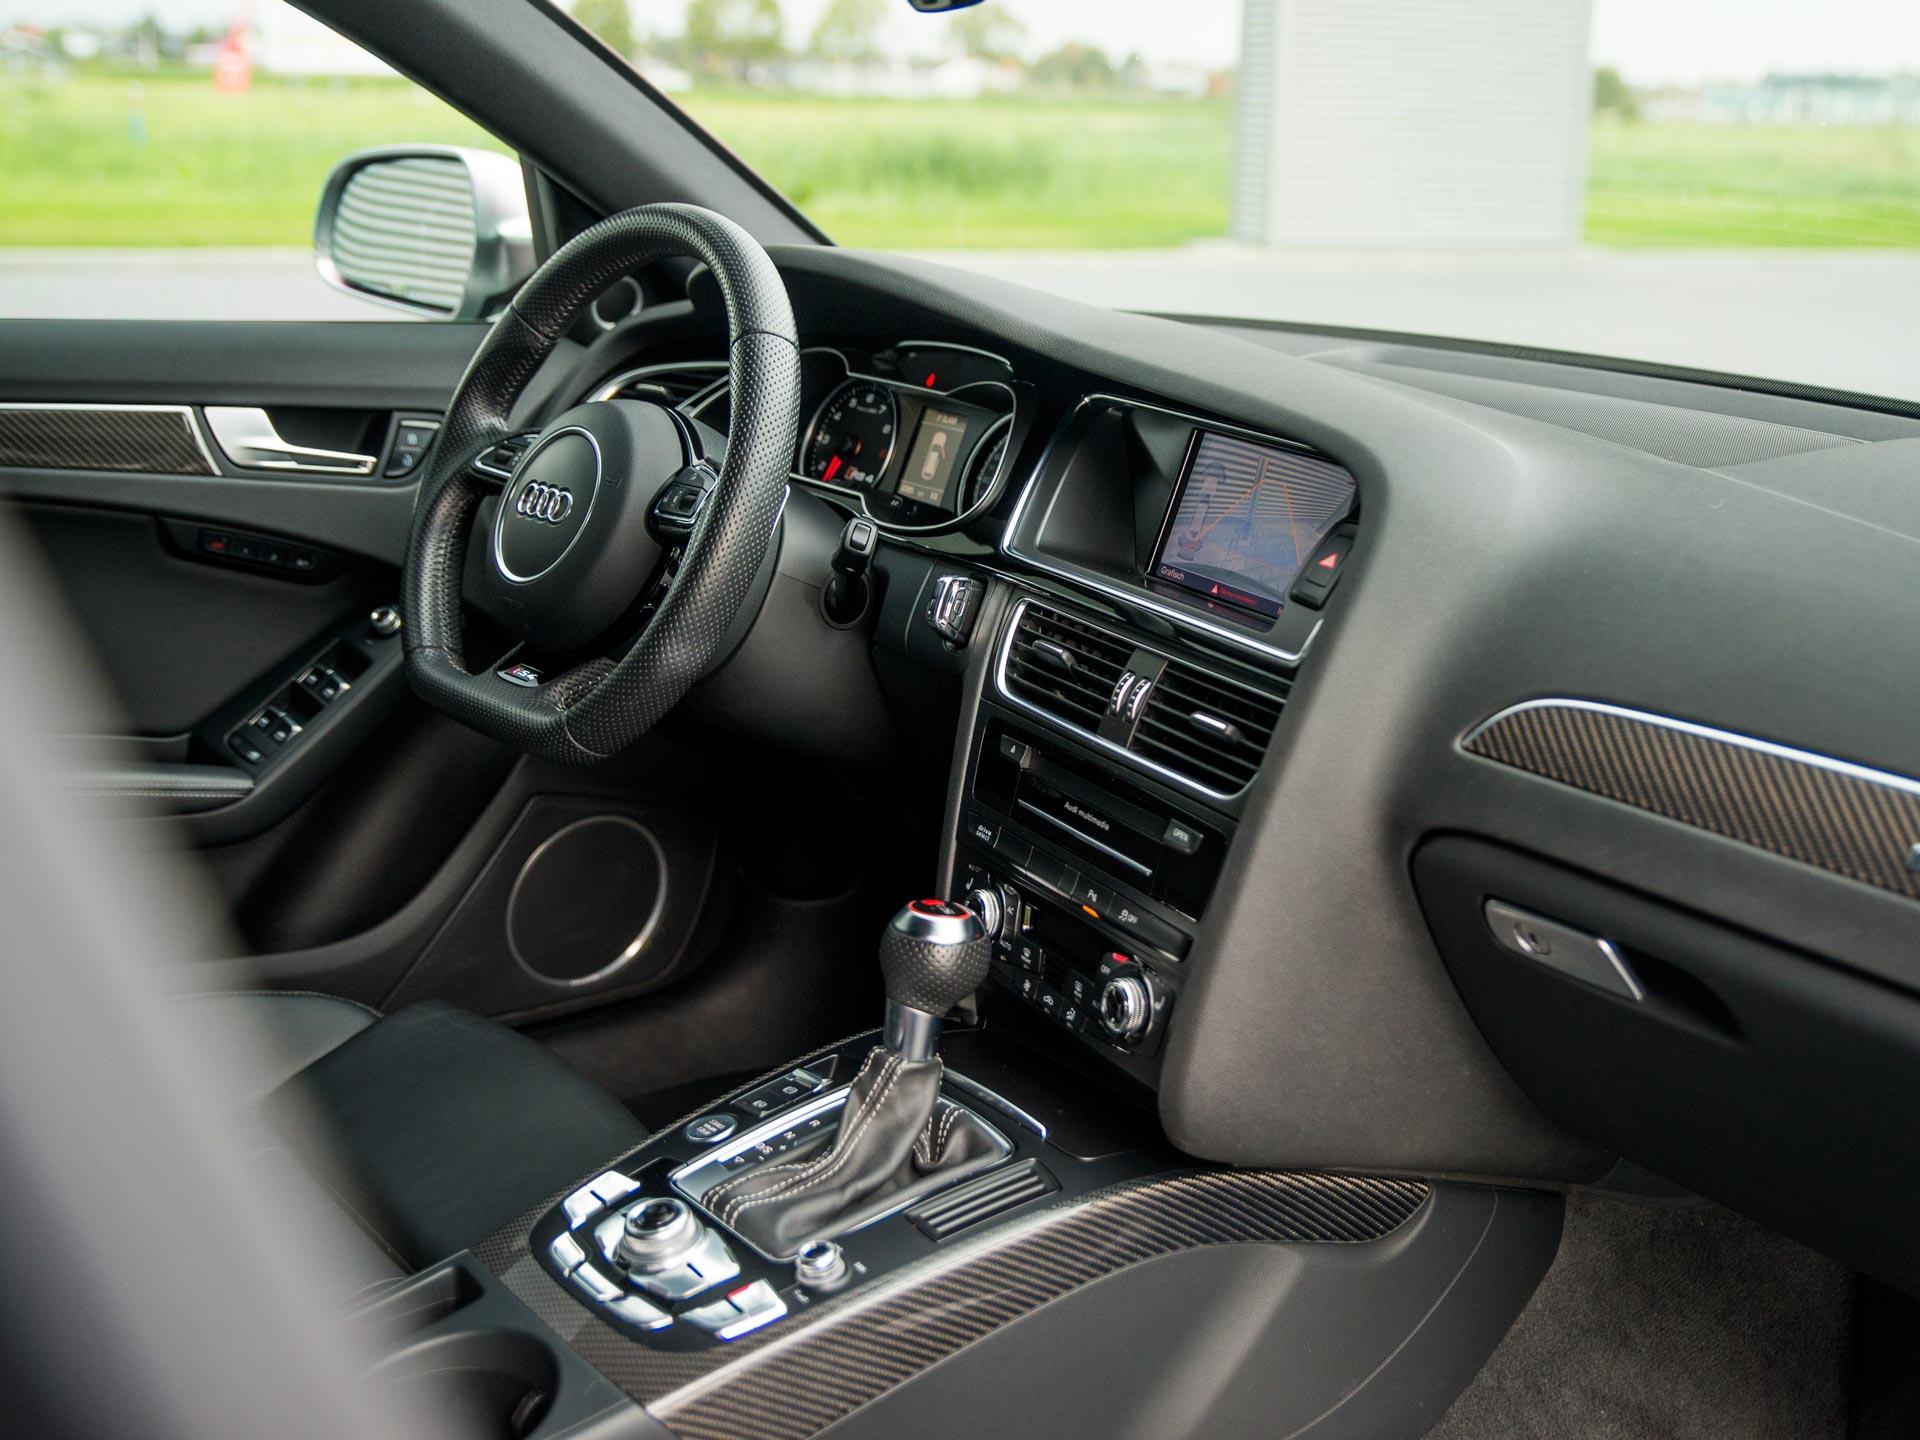 Tweedehands Audi RS4 Avant uit 2012 occasion